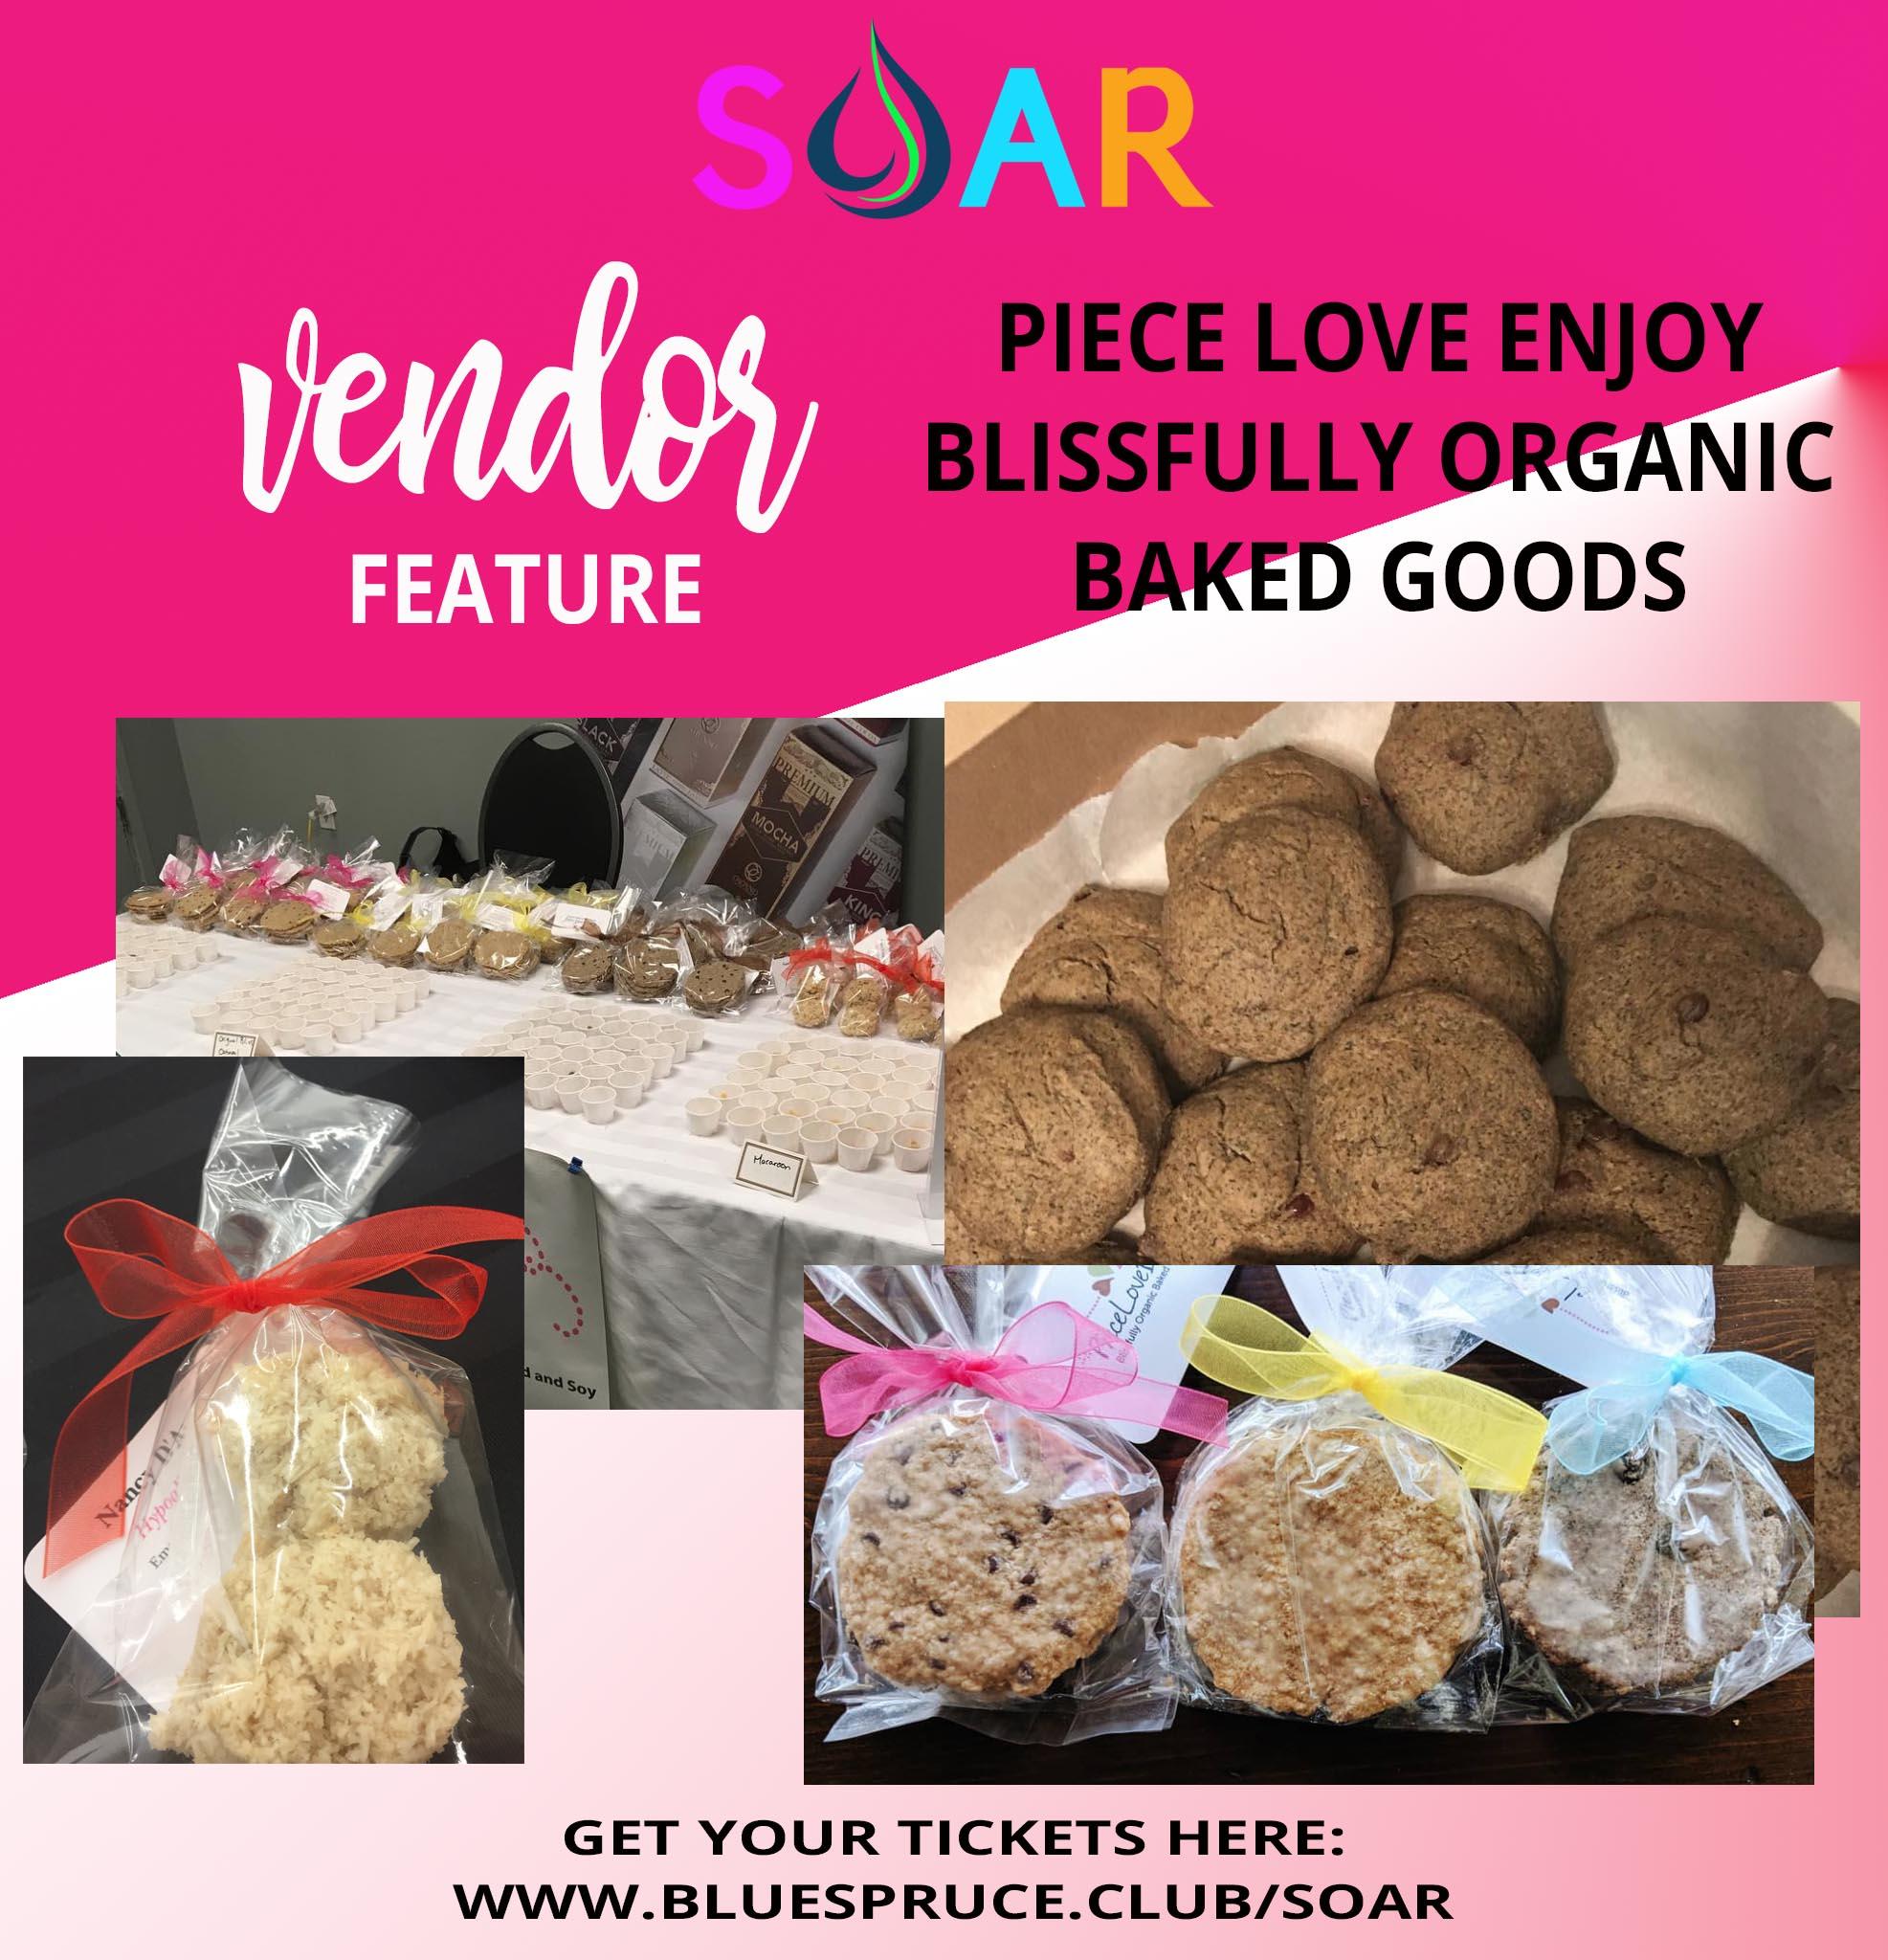 SOAR Vendor feature Piece Love Enjoy Blissfully Organic Baked Good_Nancy.jpg